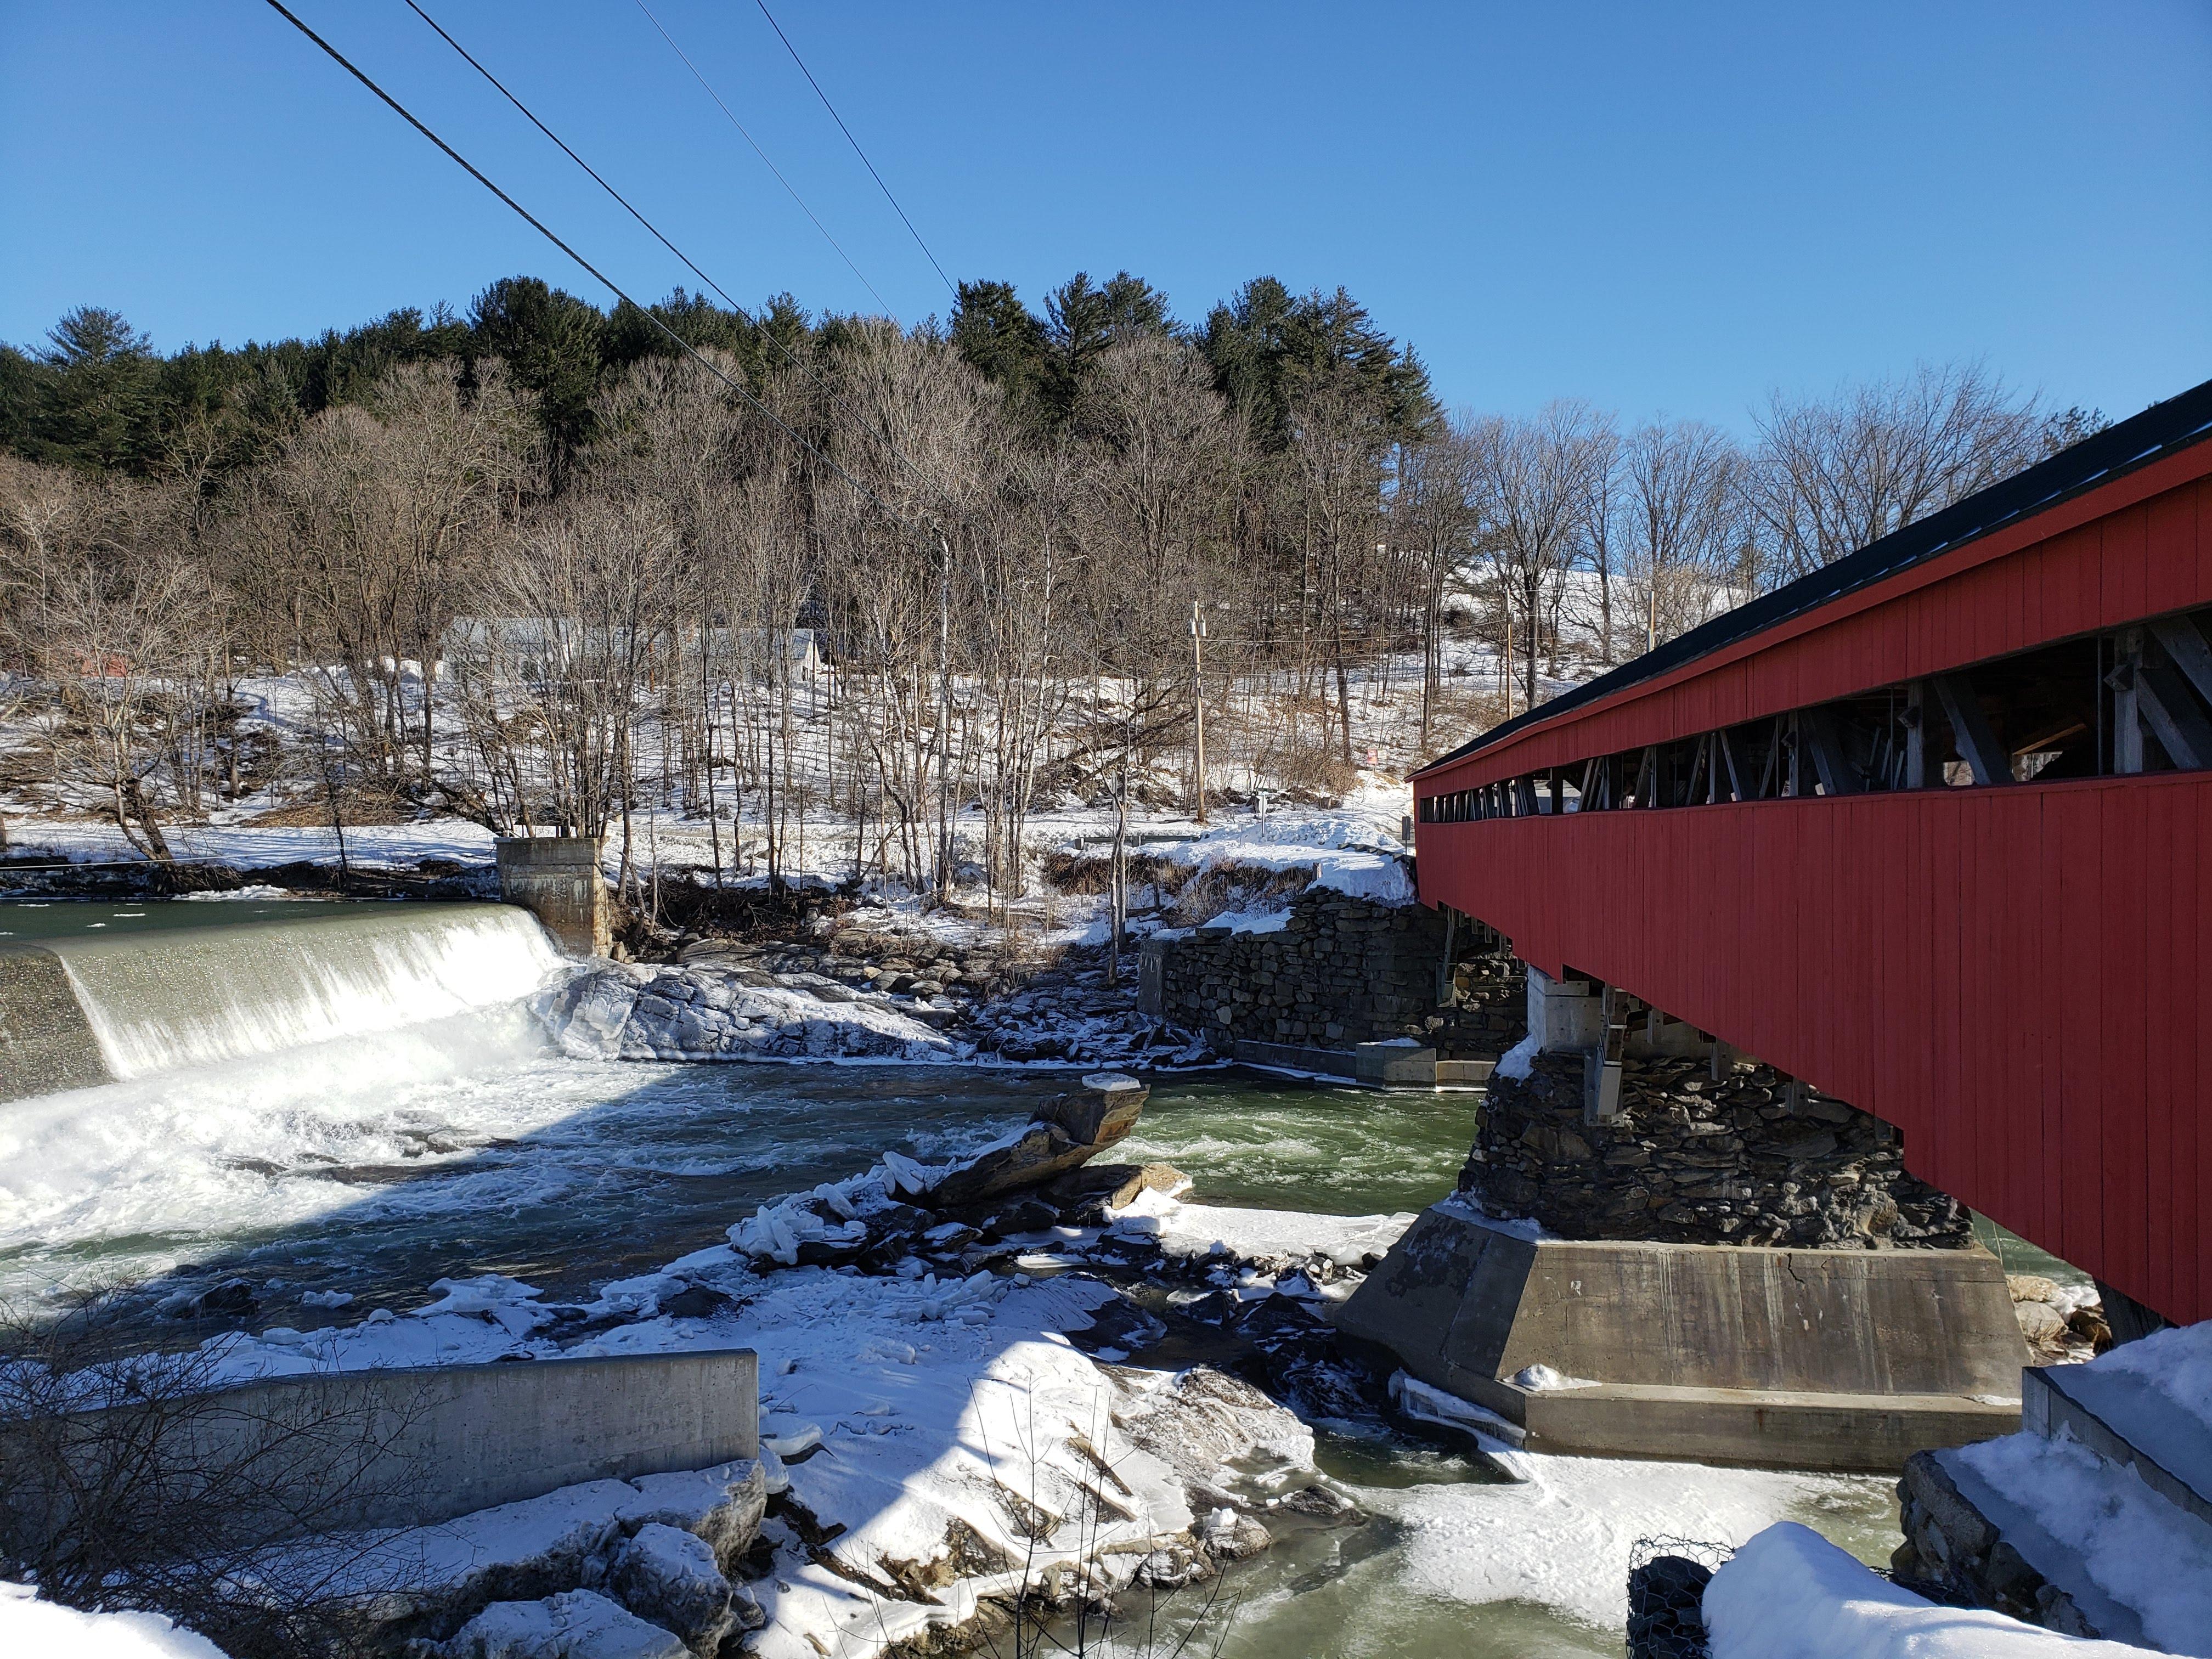 Taftsville Covered Bridge in Woodstock, VT